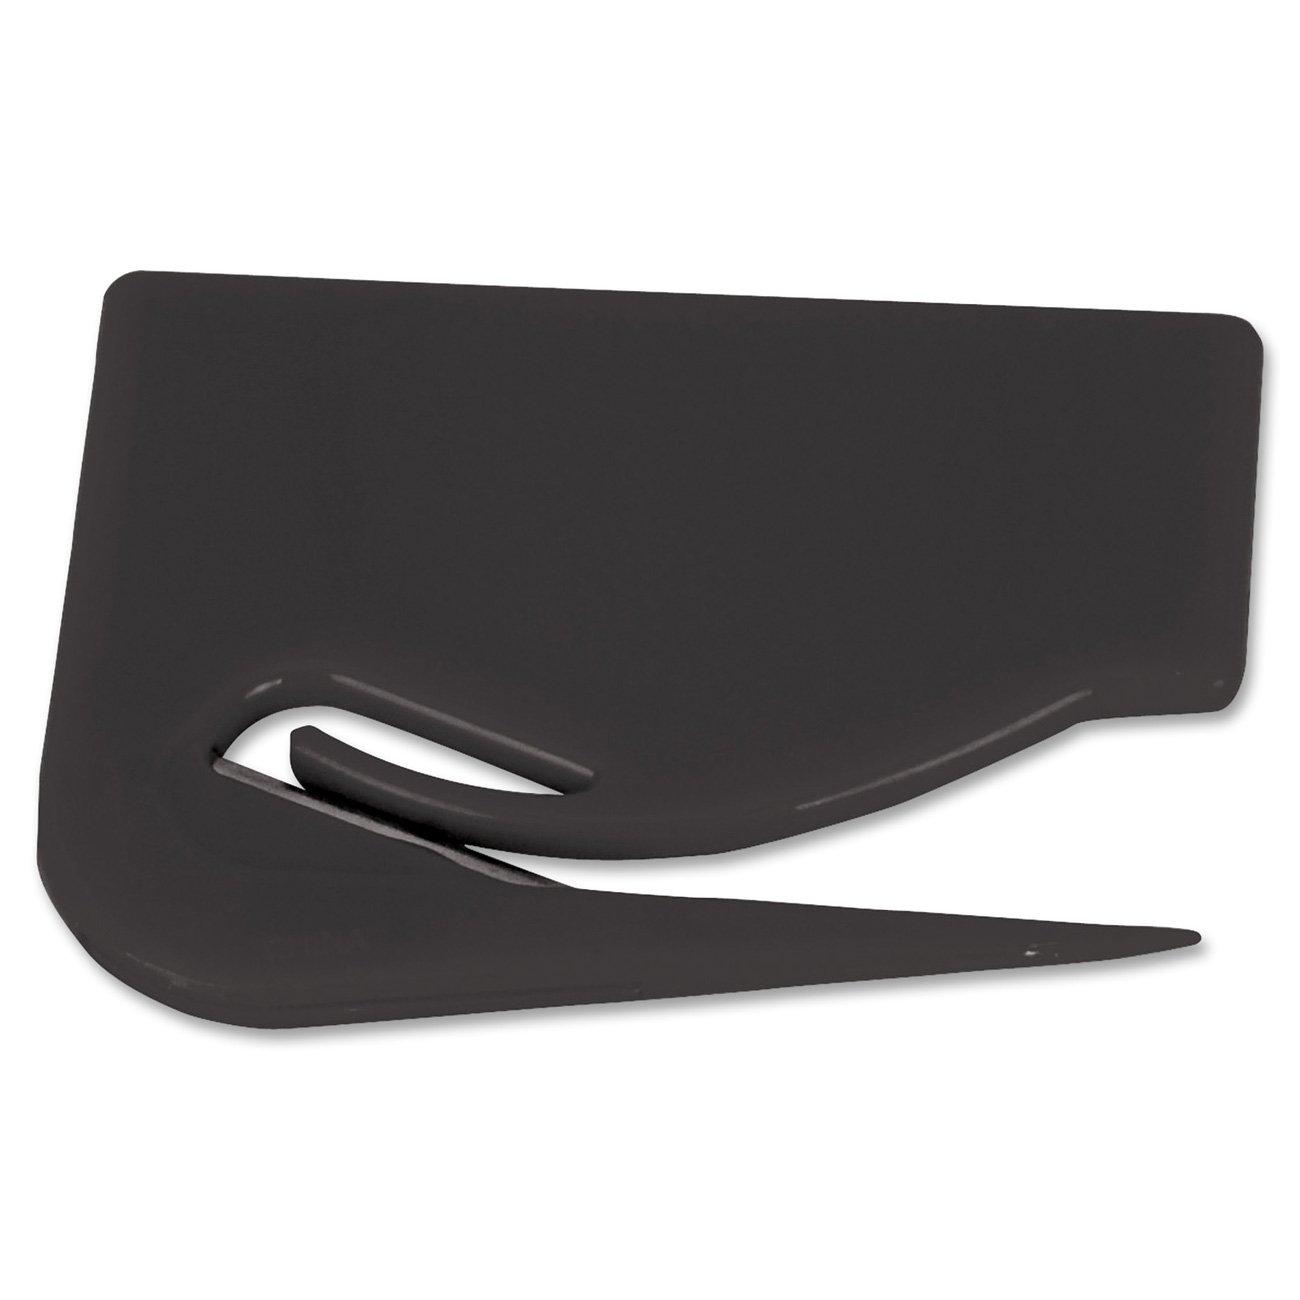 S.P. Richards Company Letter Opener, Plastic, 2-7/8 x 2-1/8 Inches, Black (SPR11818)